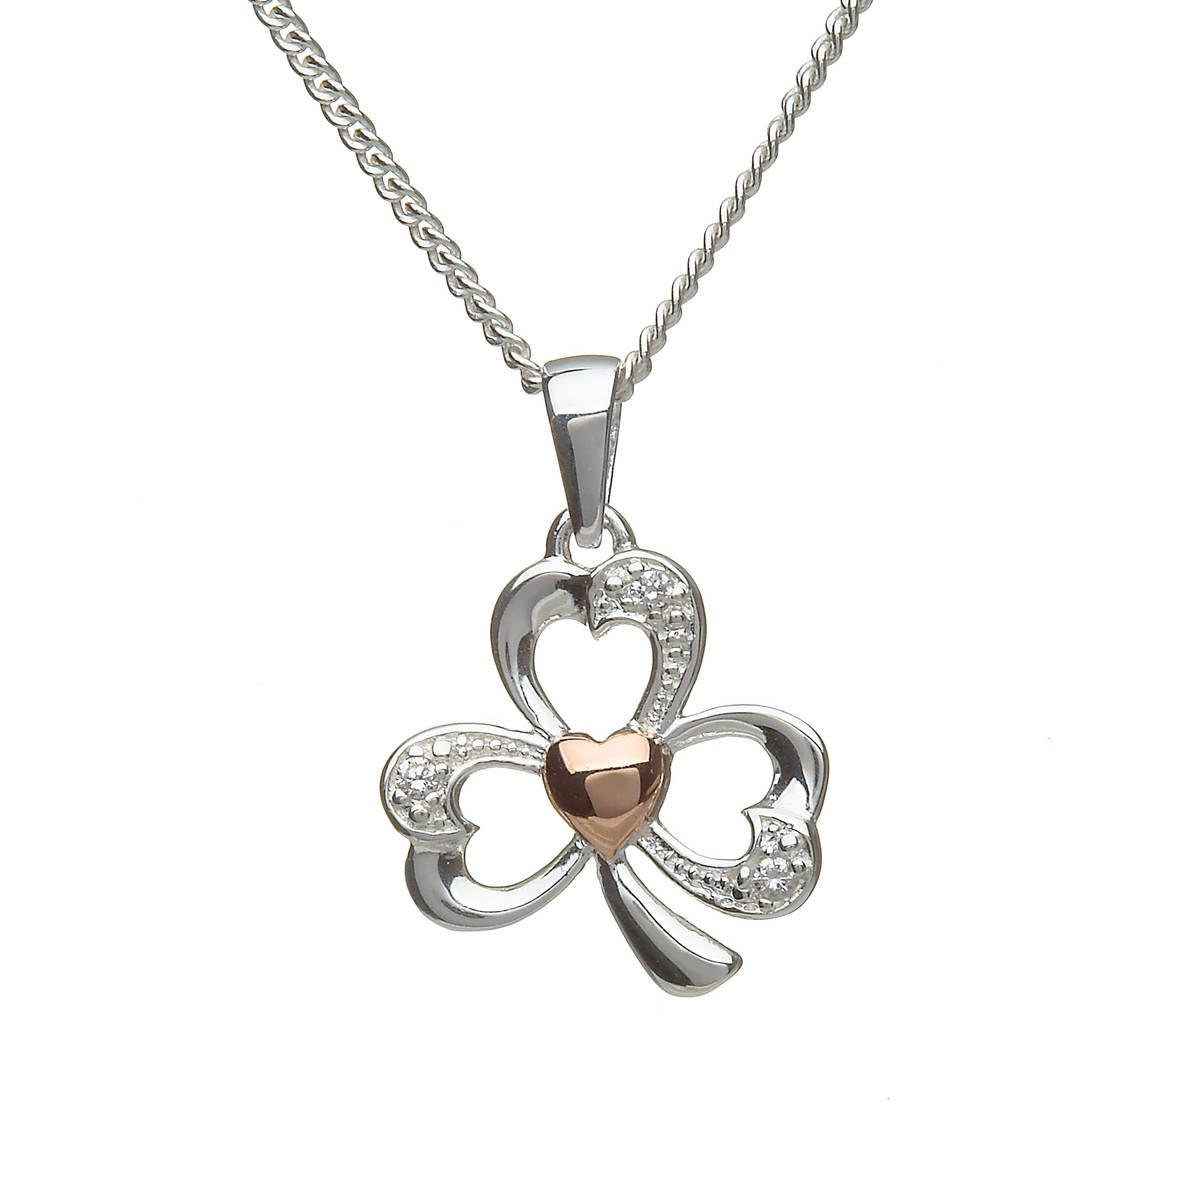 Silver Cz Rose Gold Plated Heart Shamrock Pendant